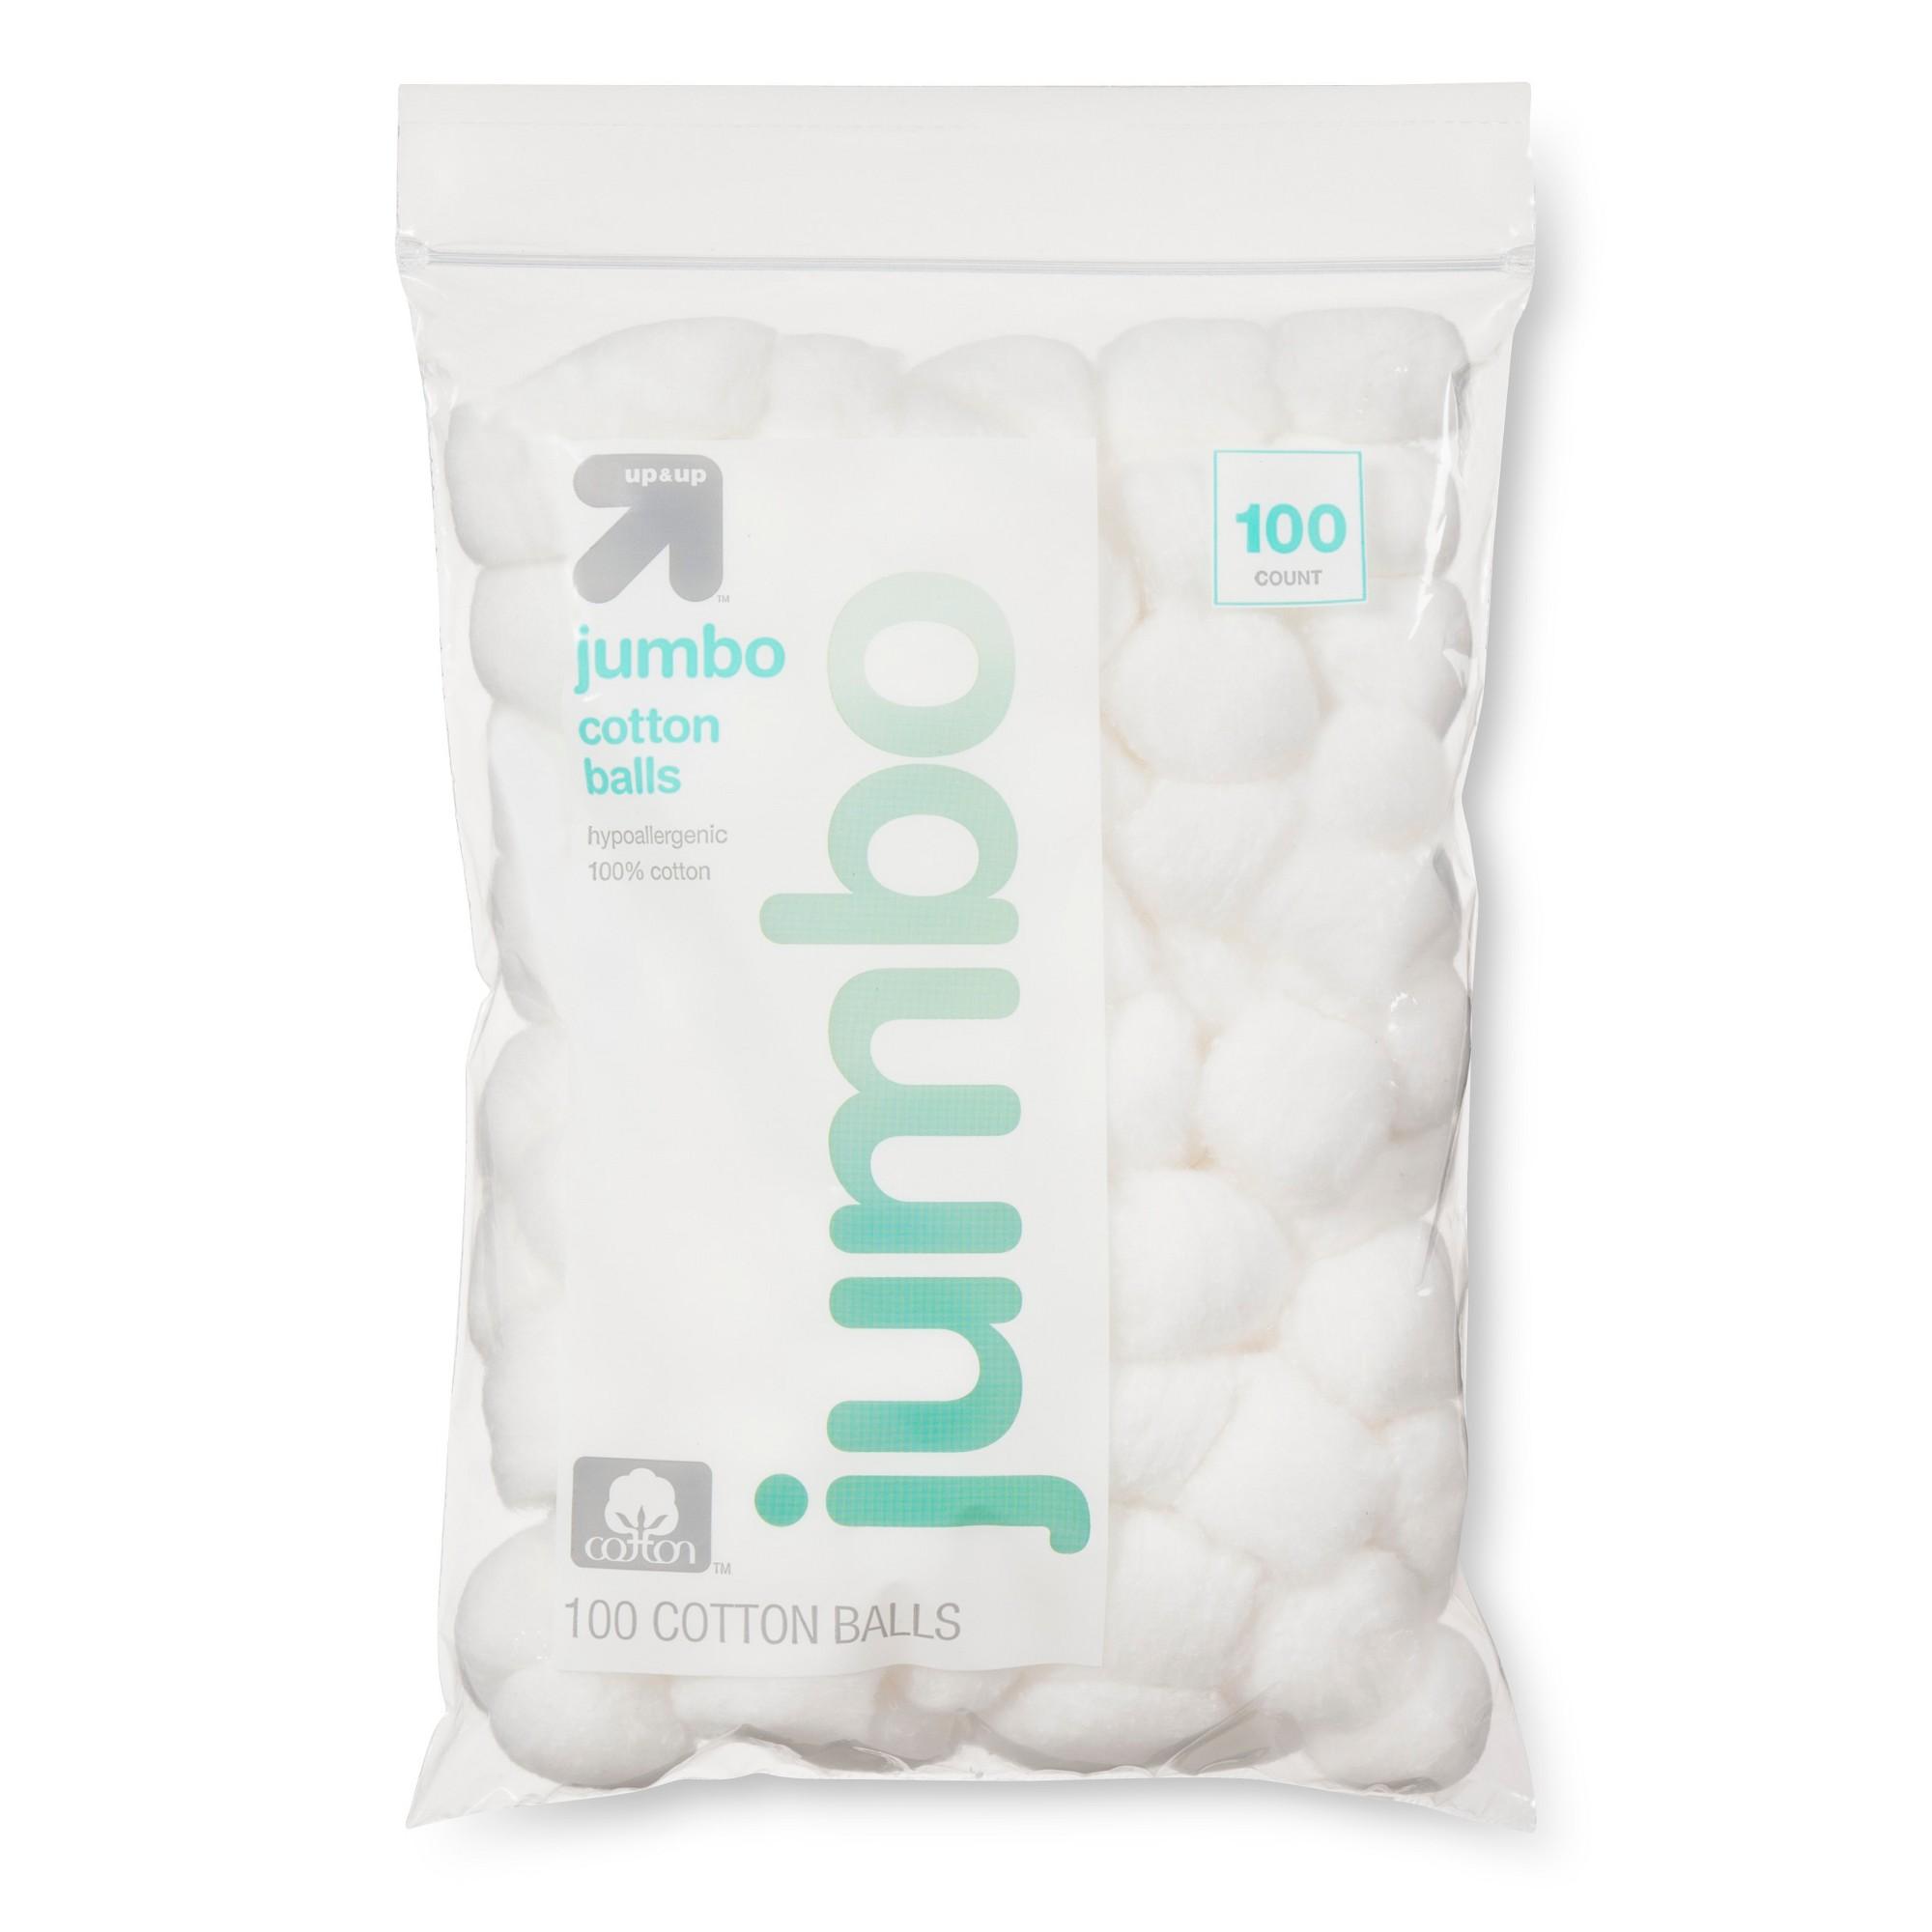 Jumbo Cotton Balls - 100ct - Up&Up